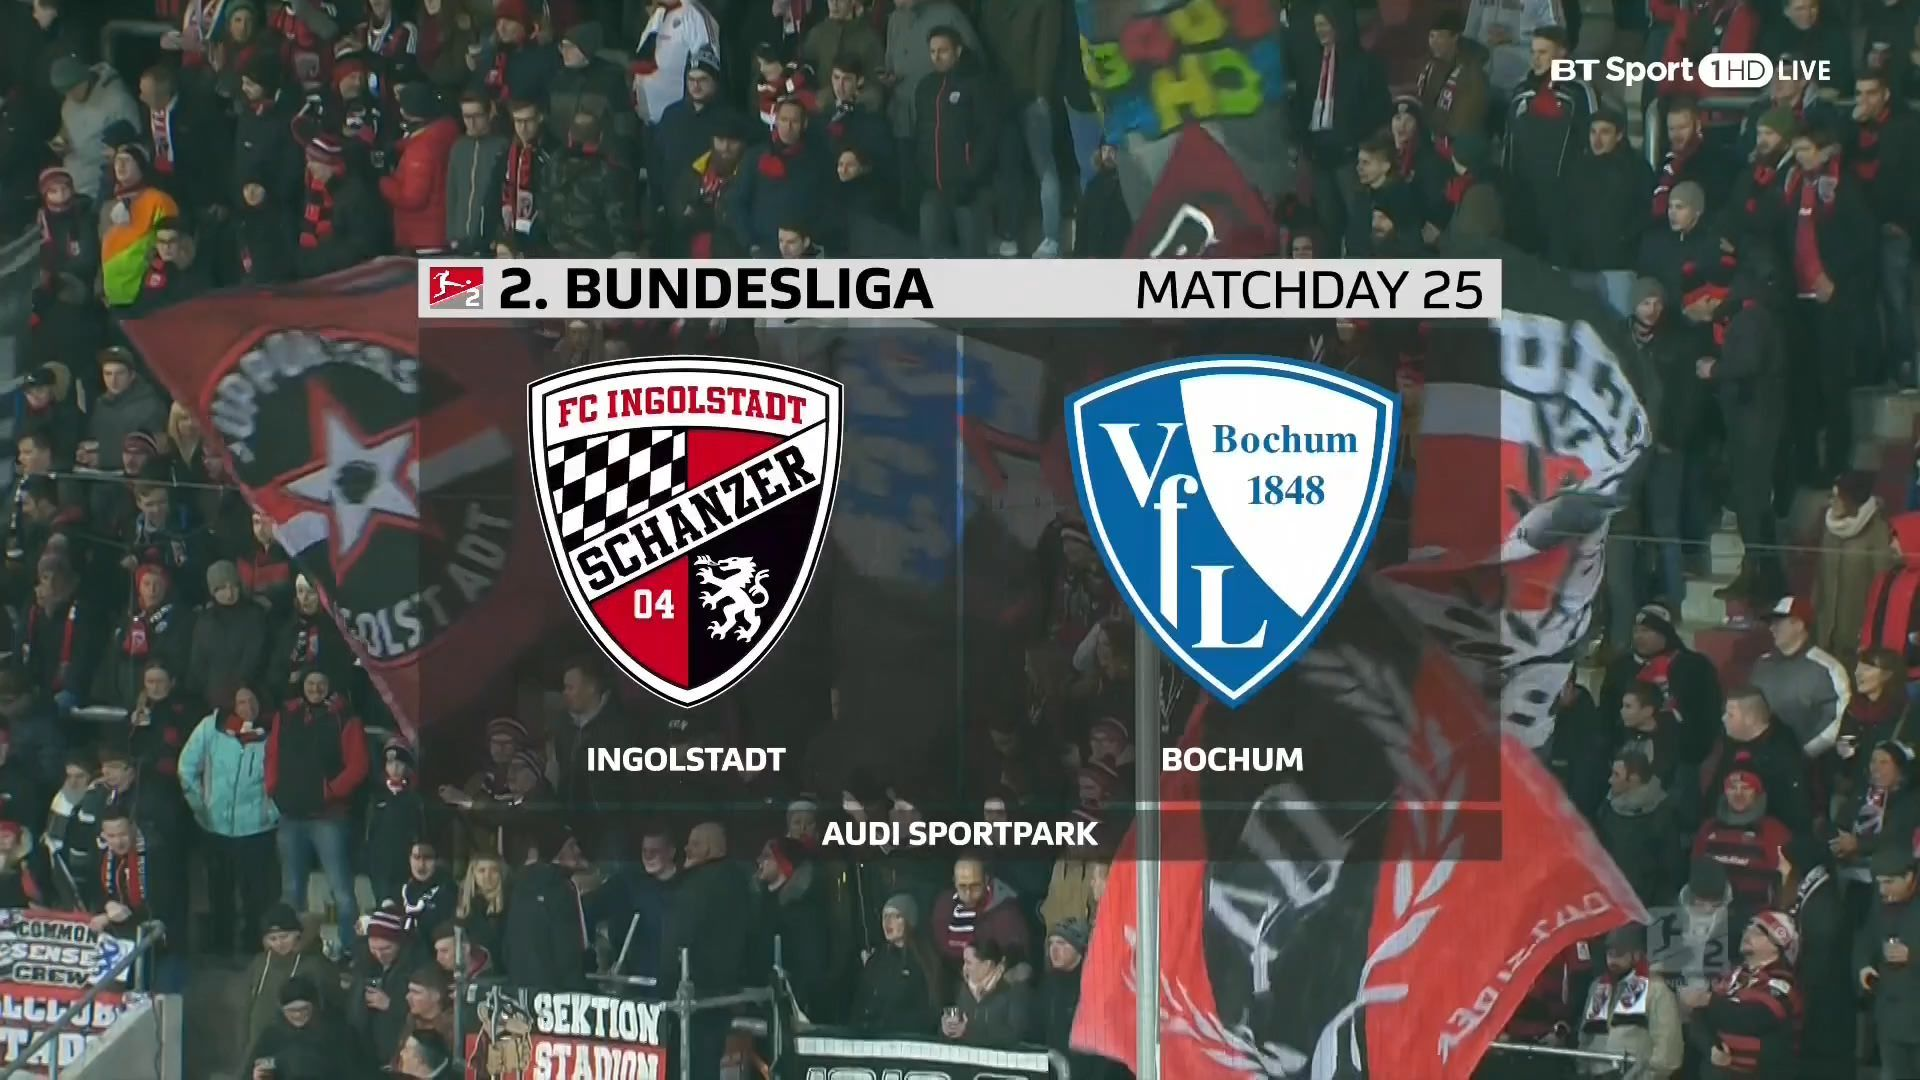 Pin by Football Live Stream on goals Bundesliga 2 17/18